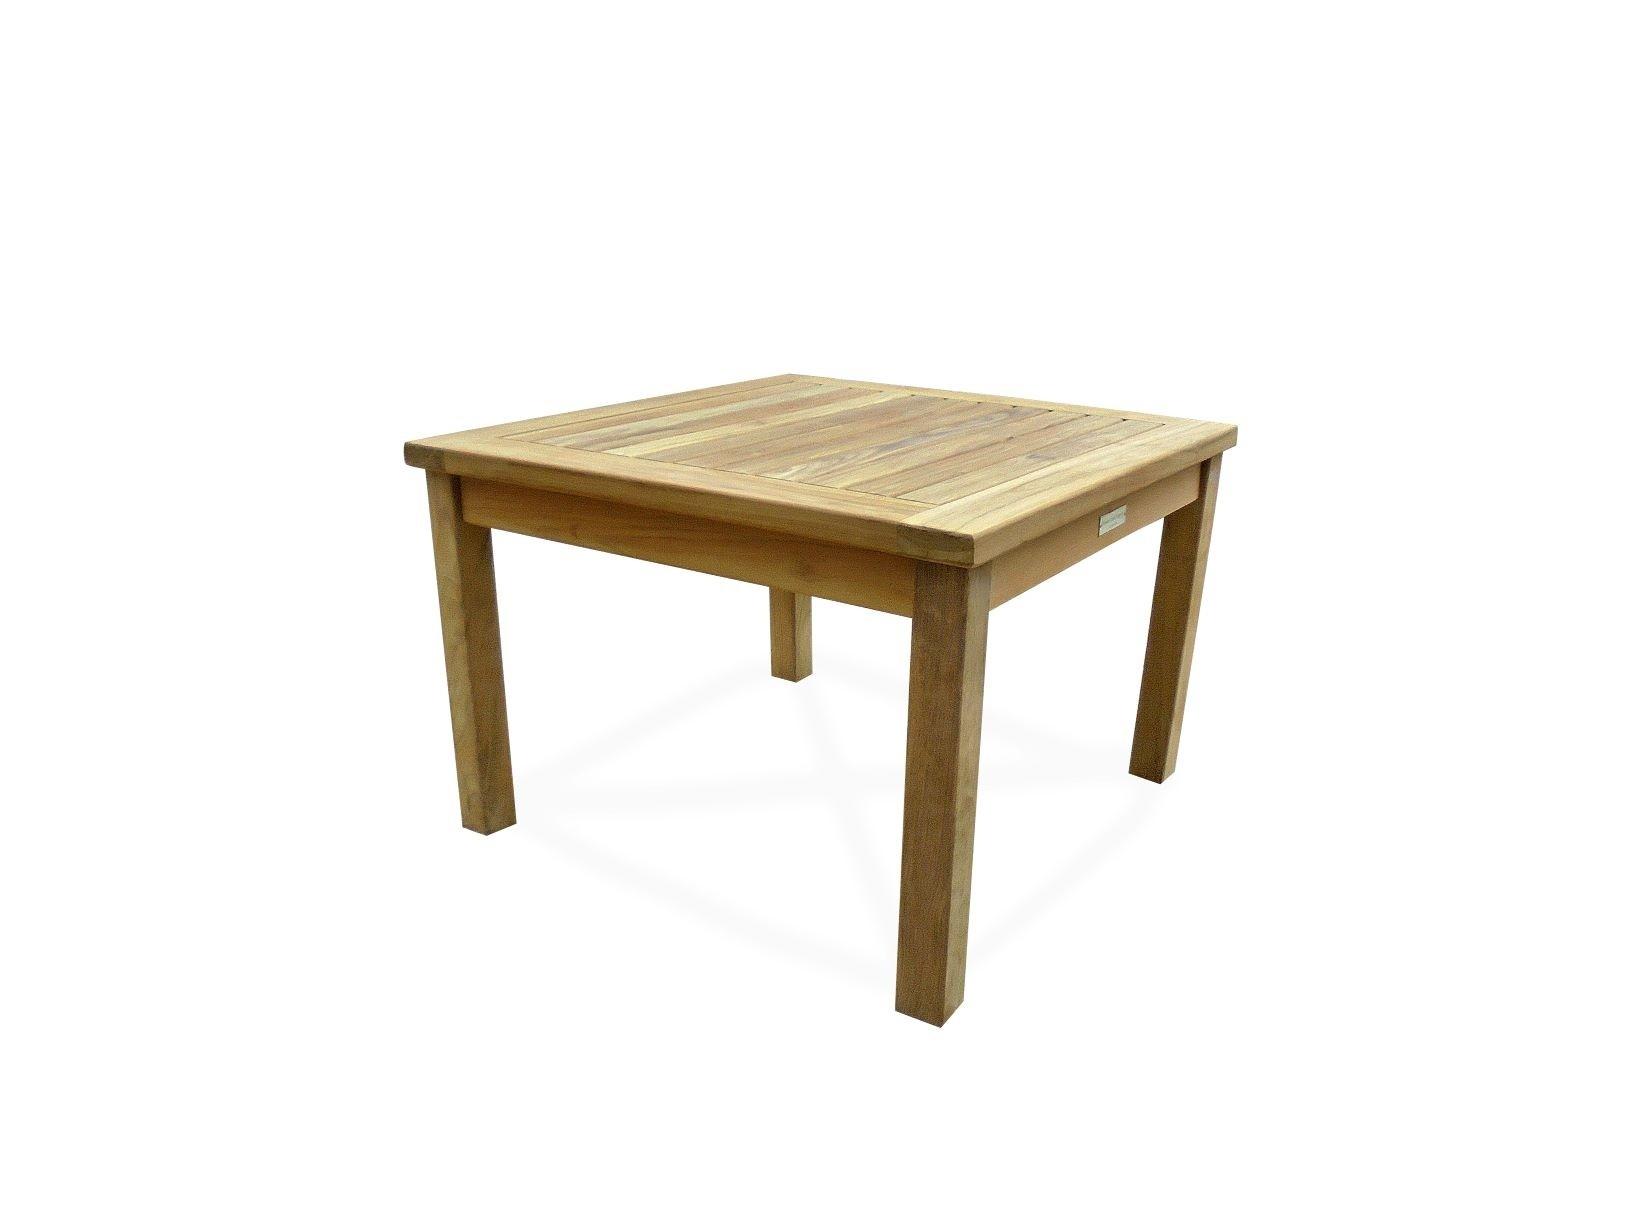 Cape Cod Square 27 x 18 H Teak Coffee Table